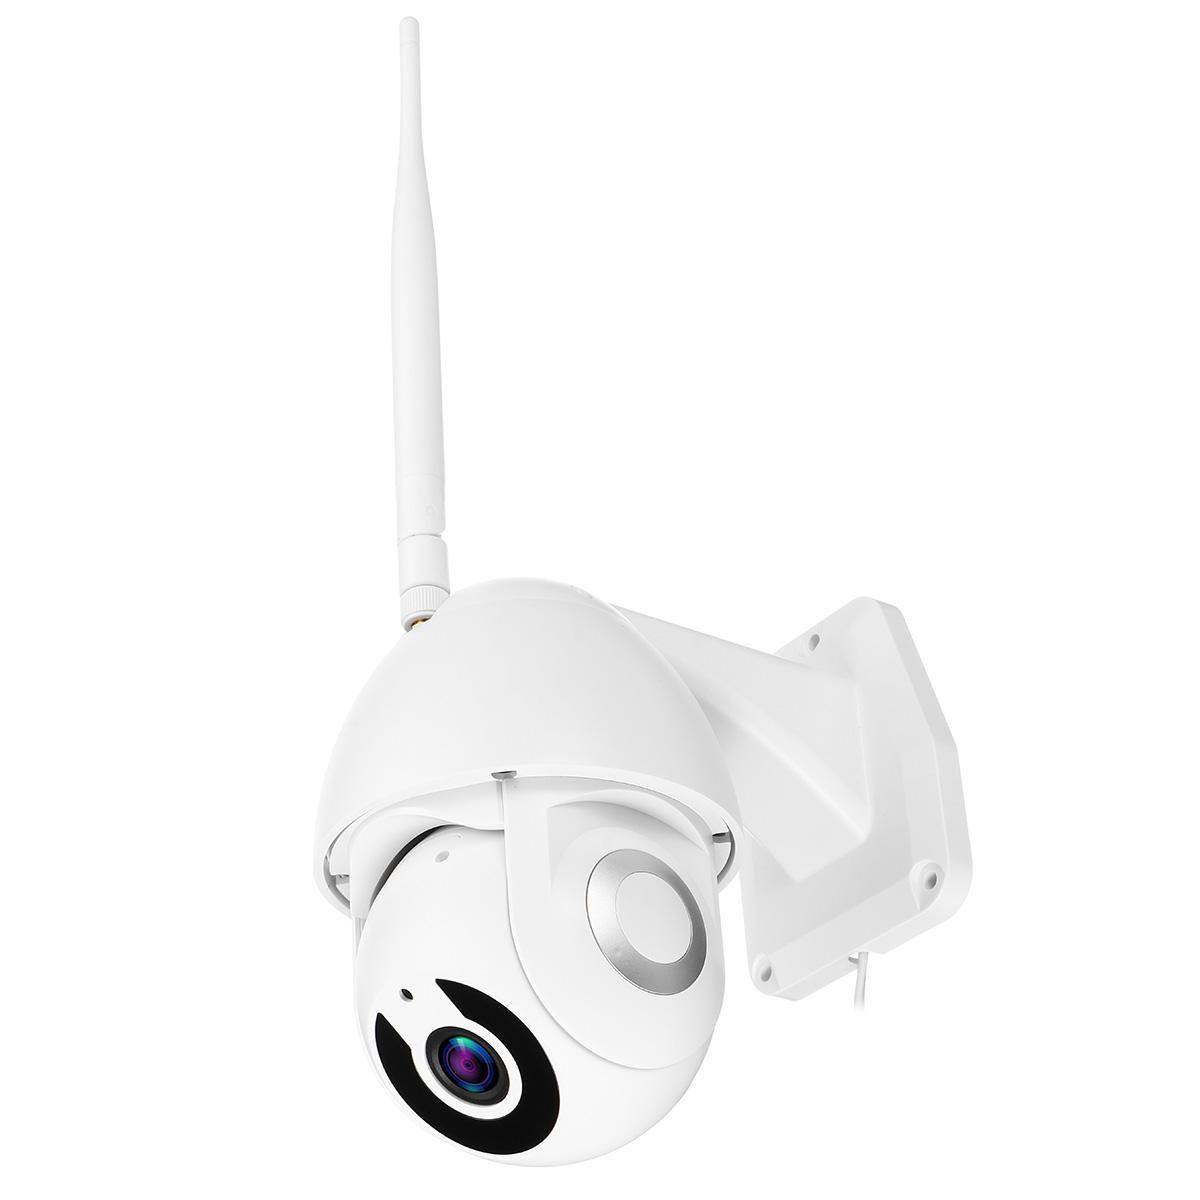 5X Zoom Waterproof WiFi IP Camera PTZ Pan Tilt 1080P HD Security IR Camera Night Vision - UK plug